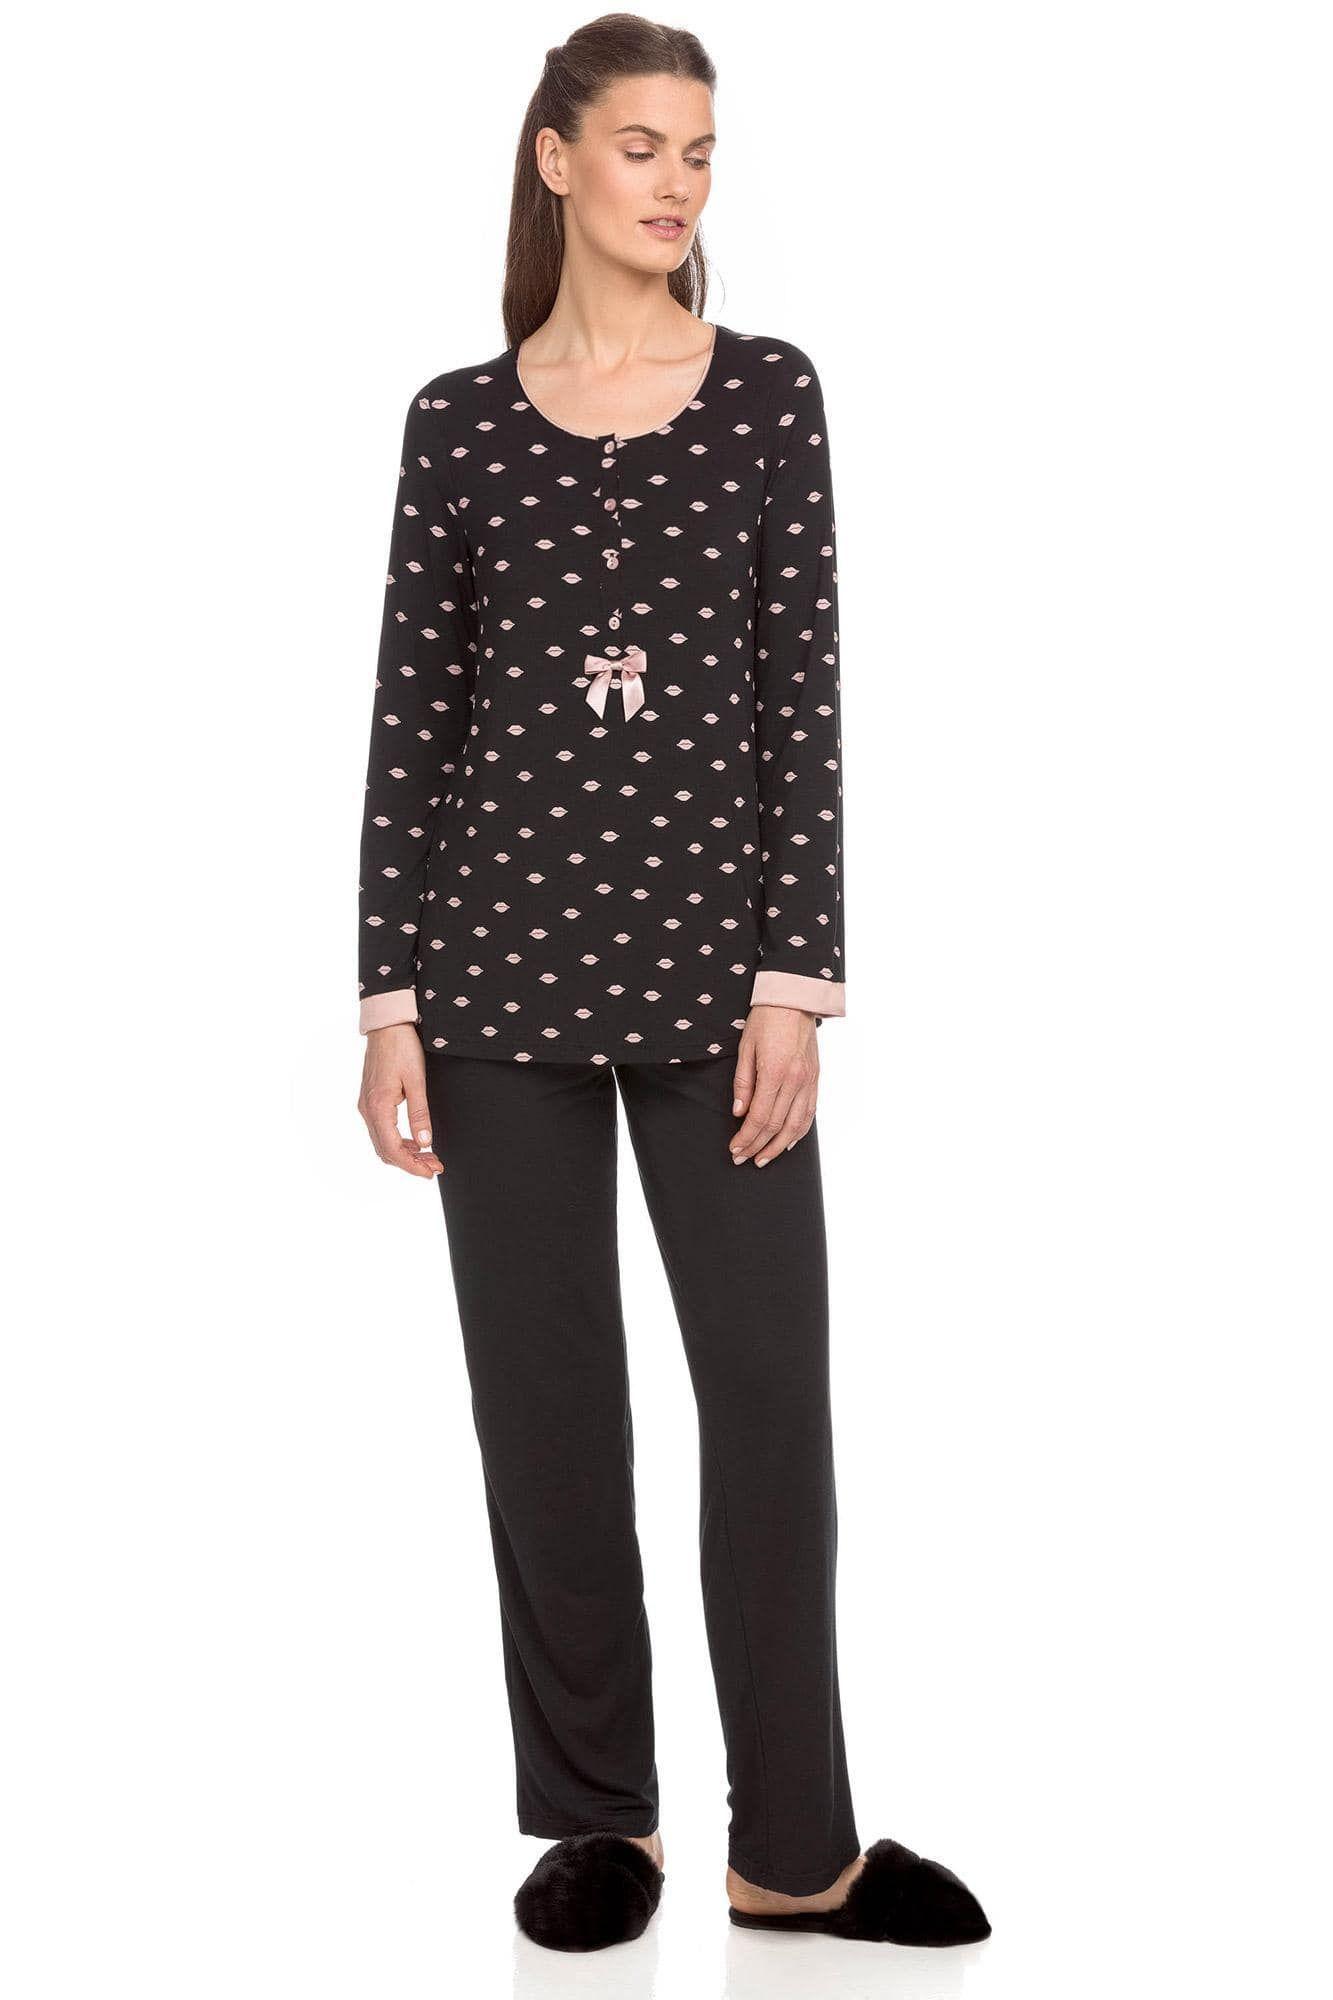 Women Pyjamas with button placket